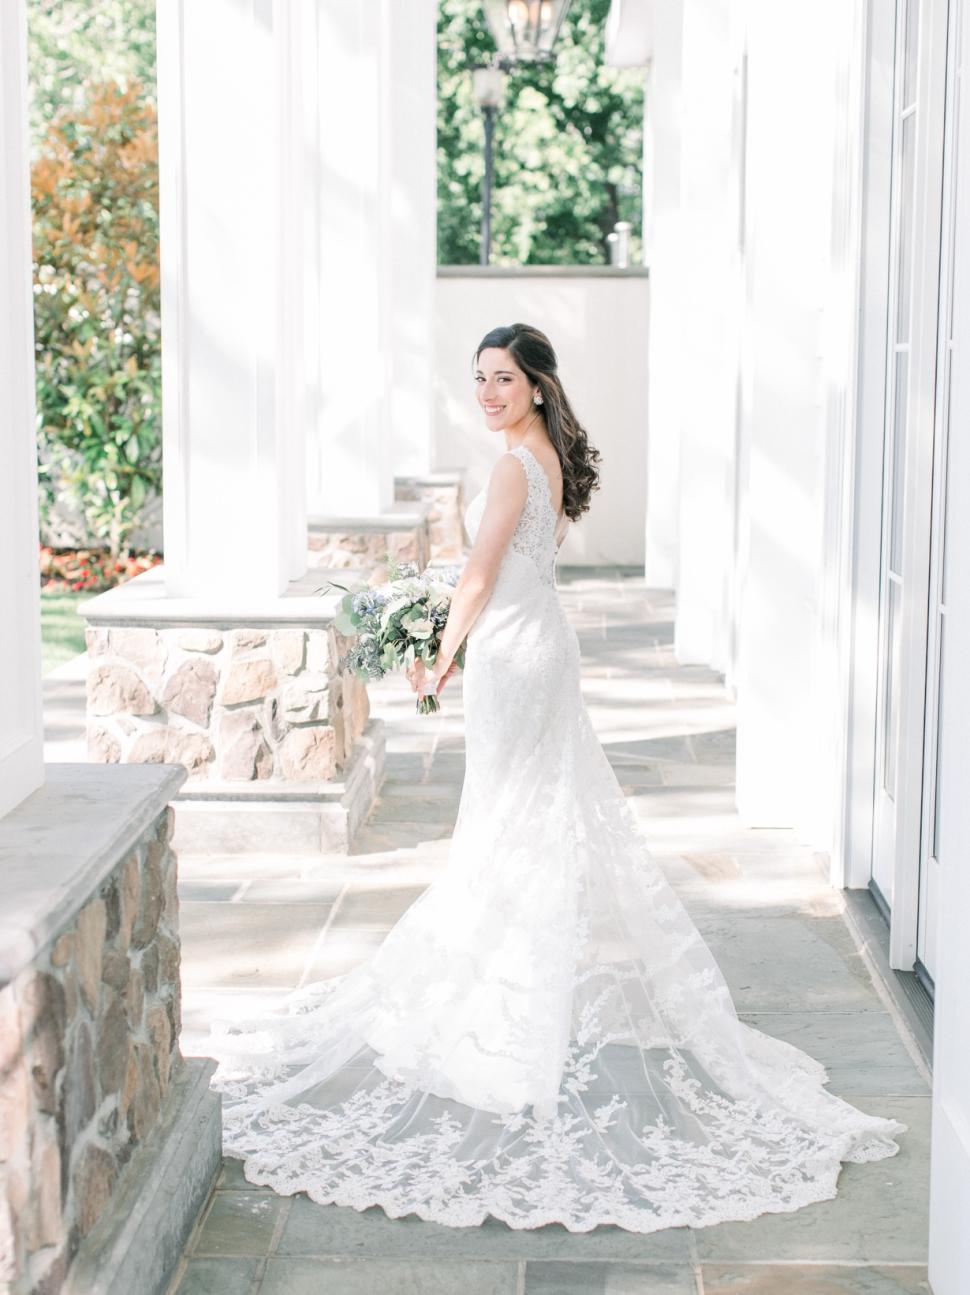 Ryland-Inn-Wedding-Photographer-Cassi-Claire_Ryland-Inn-Wedding_21.jpg